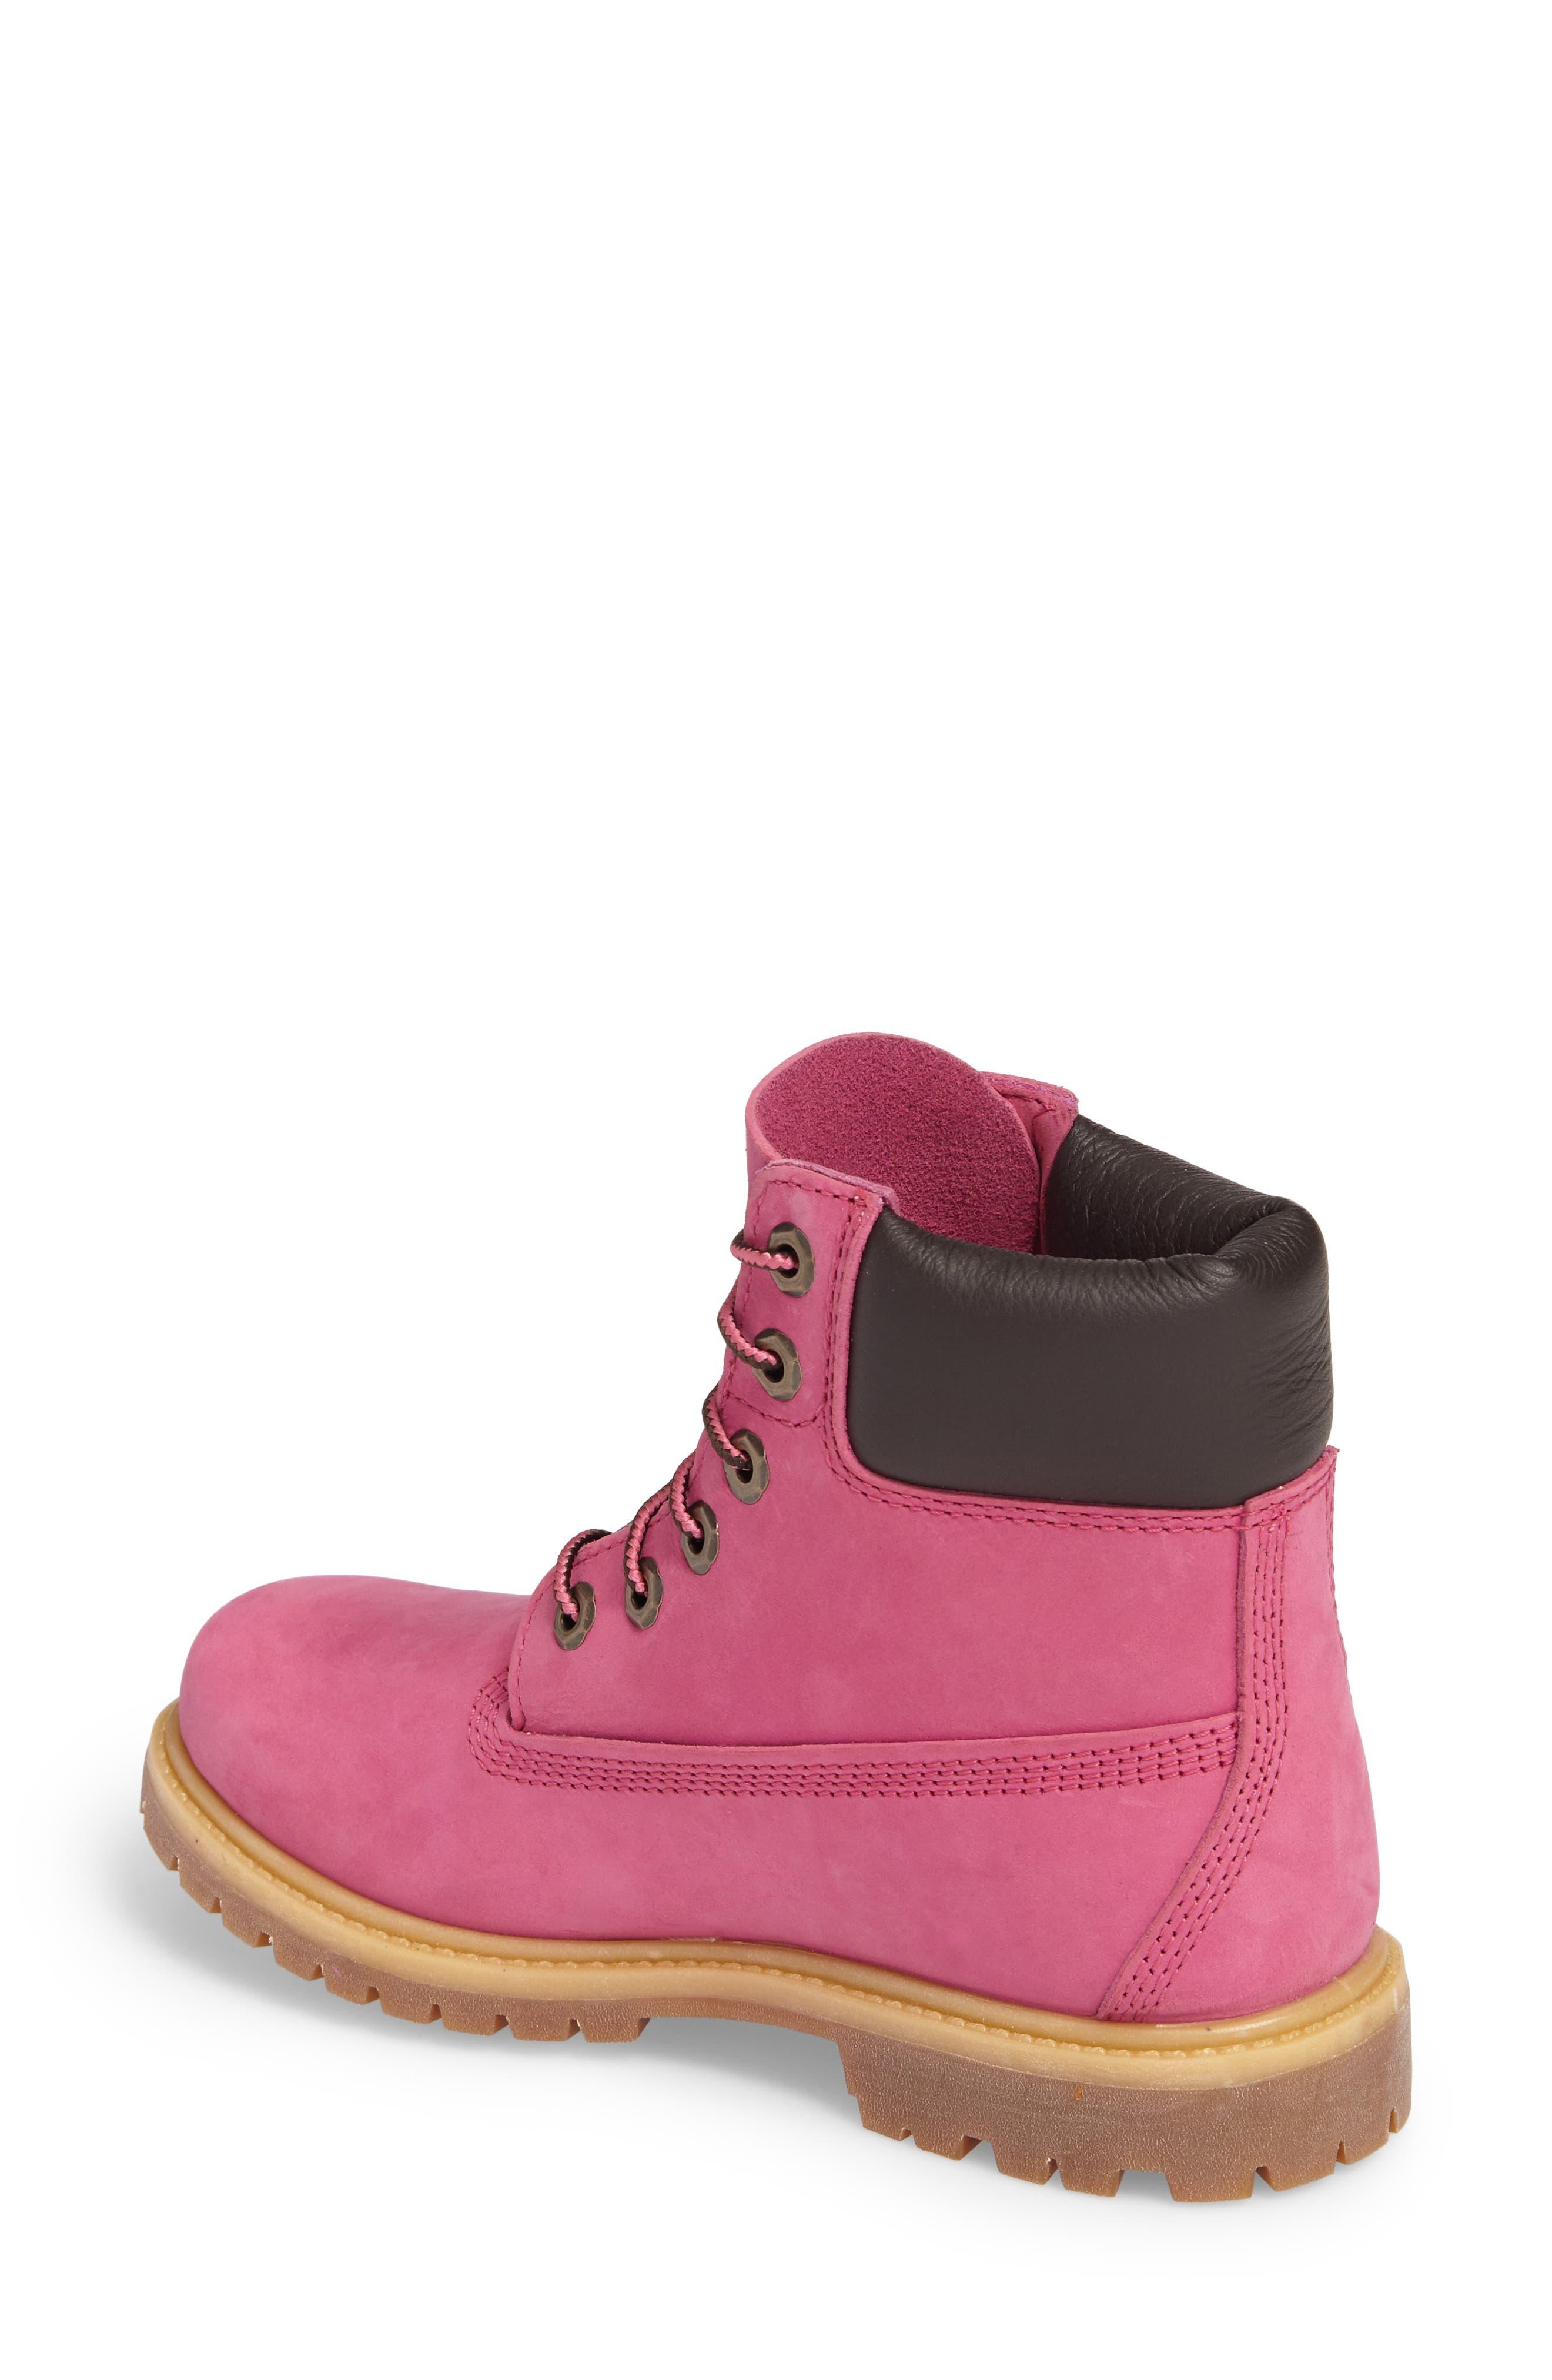 x Susan G. Komen 6-Inch Waterproof Insulated Boot,                             Alternate thumbnail 2, color,                             678